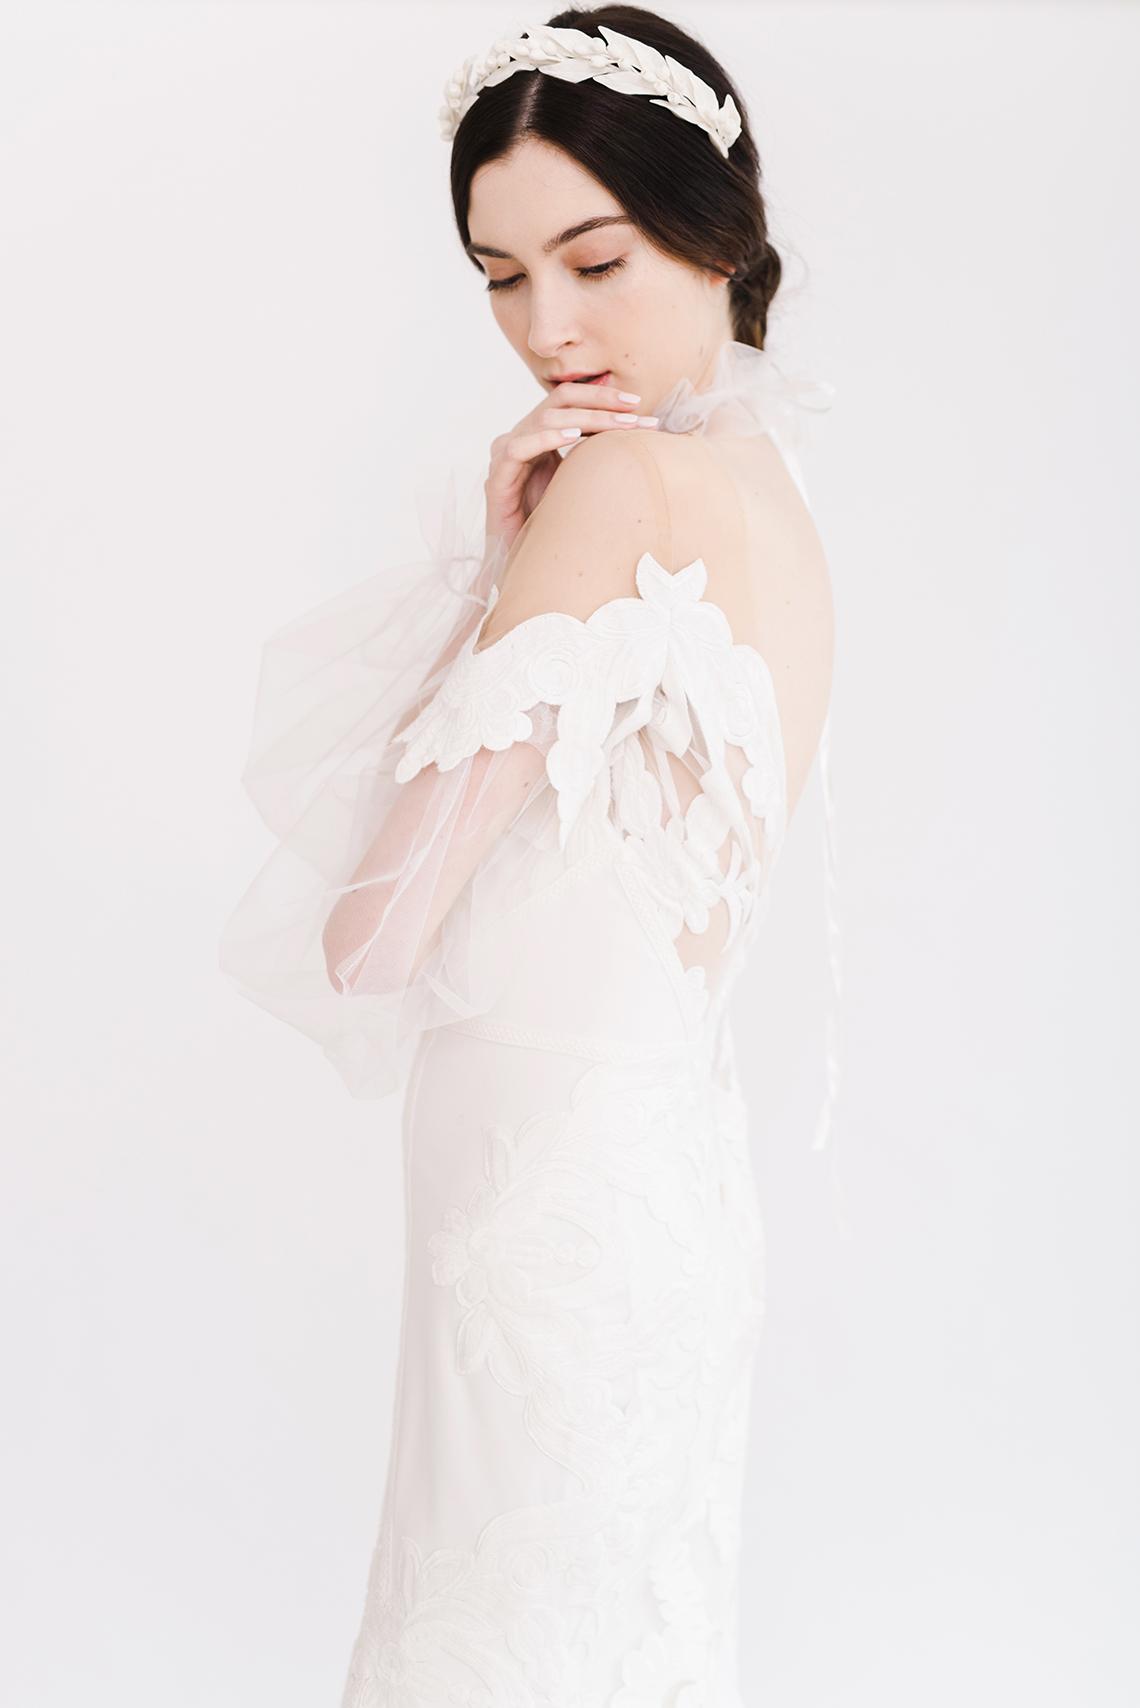 Luxurious and Fashion-Forward All White Wedding Inspiration – Emma Pilkington Photography 25